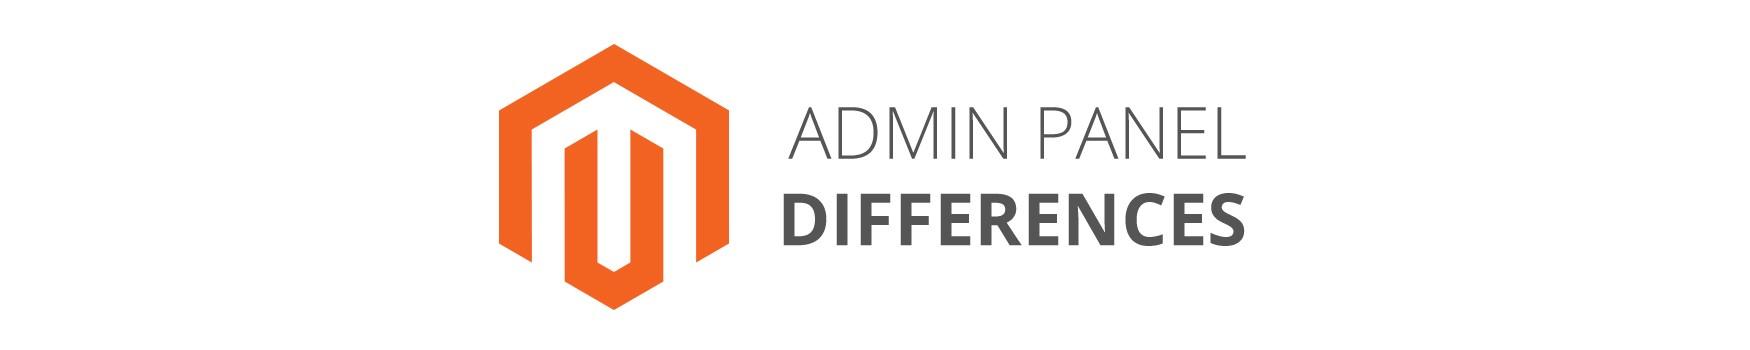 Admin Panel Differences of Magento® 1 versus Magento® 2